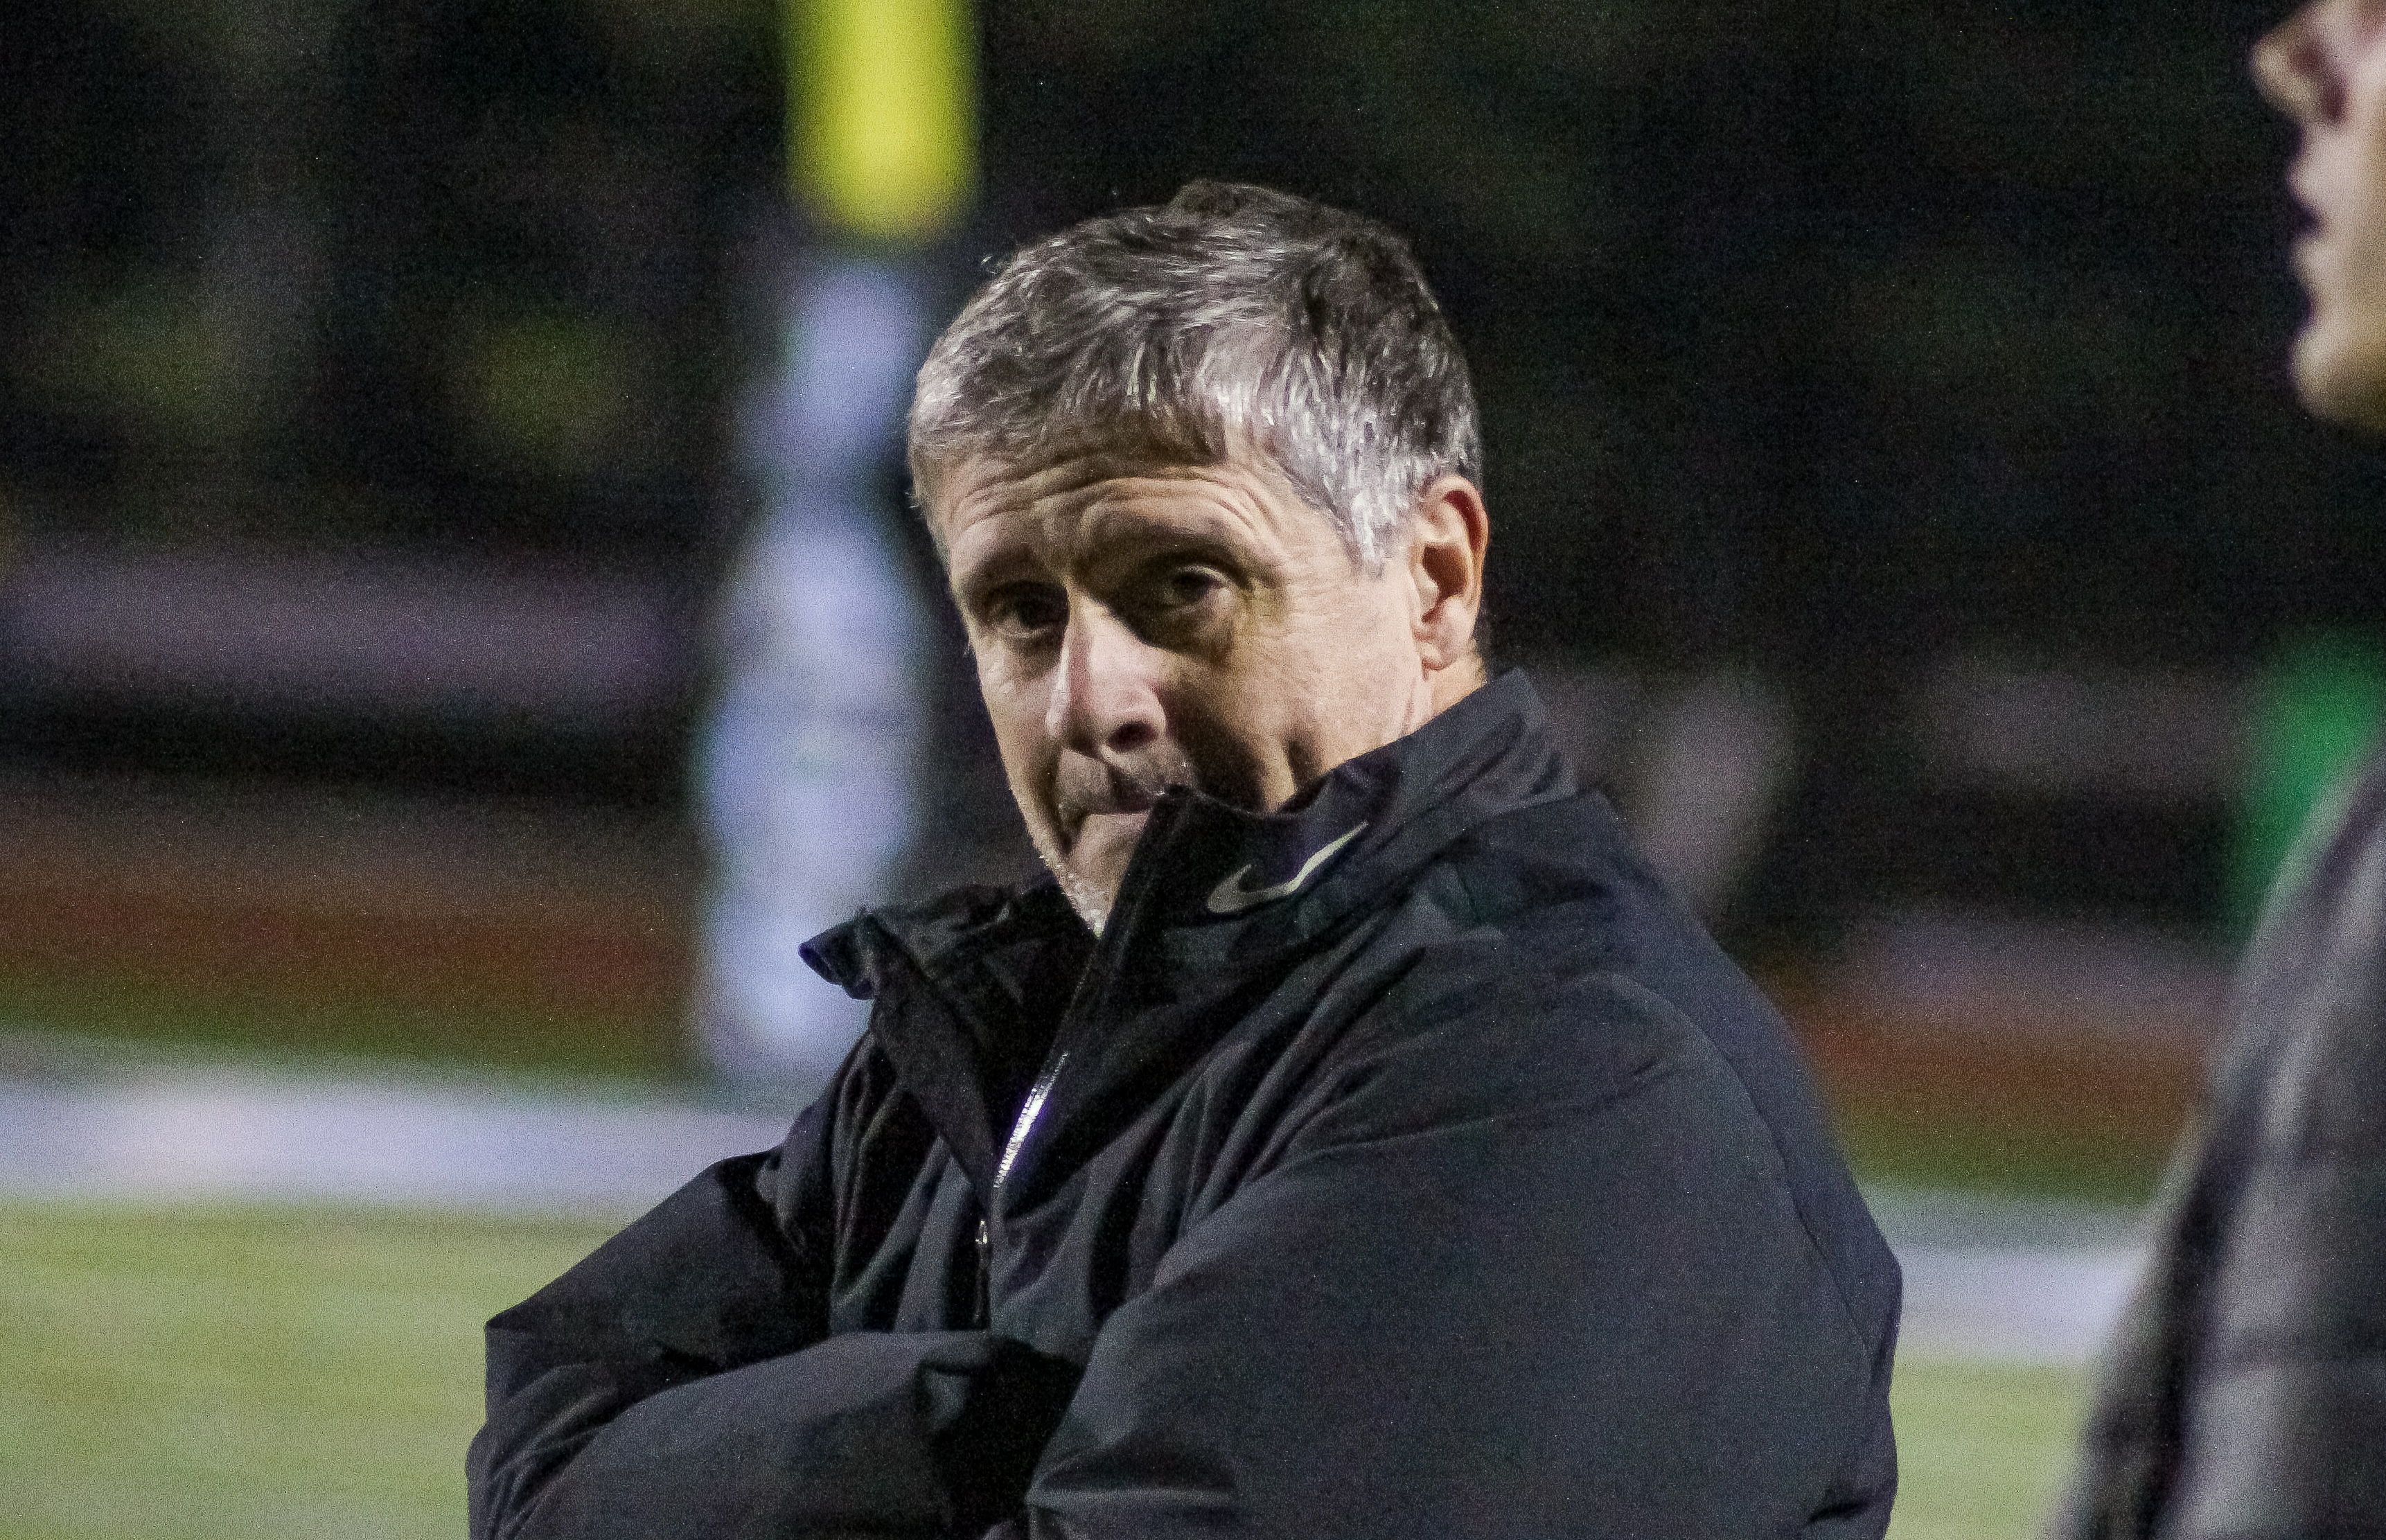 Shades Valley head coach David Partridge